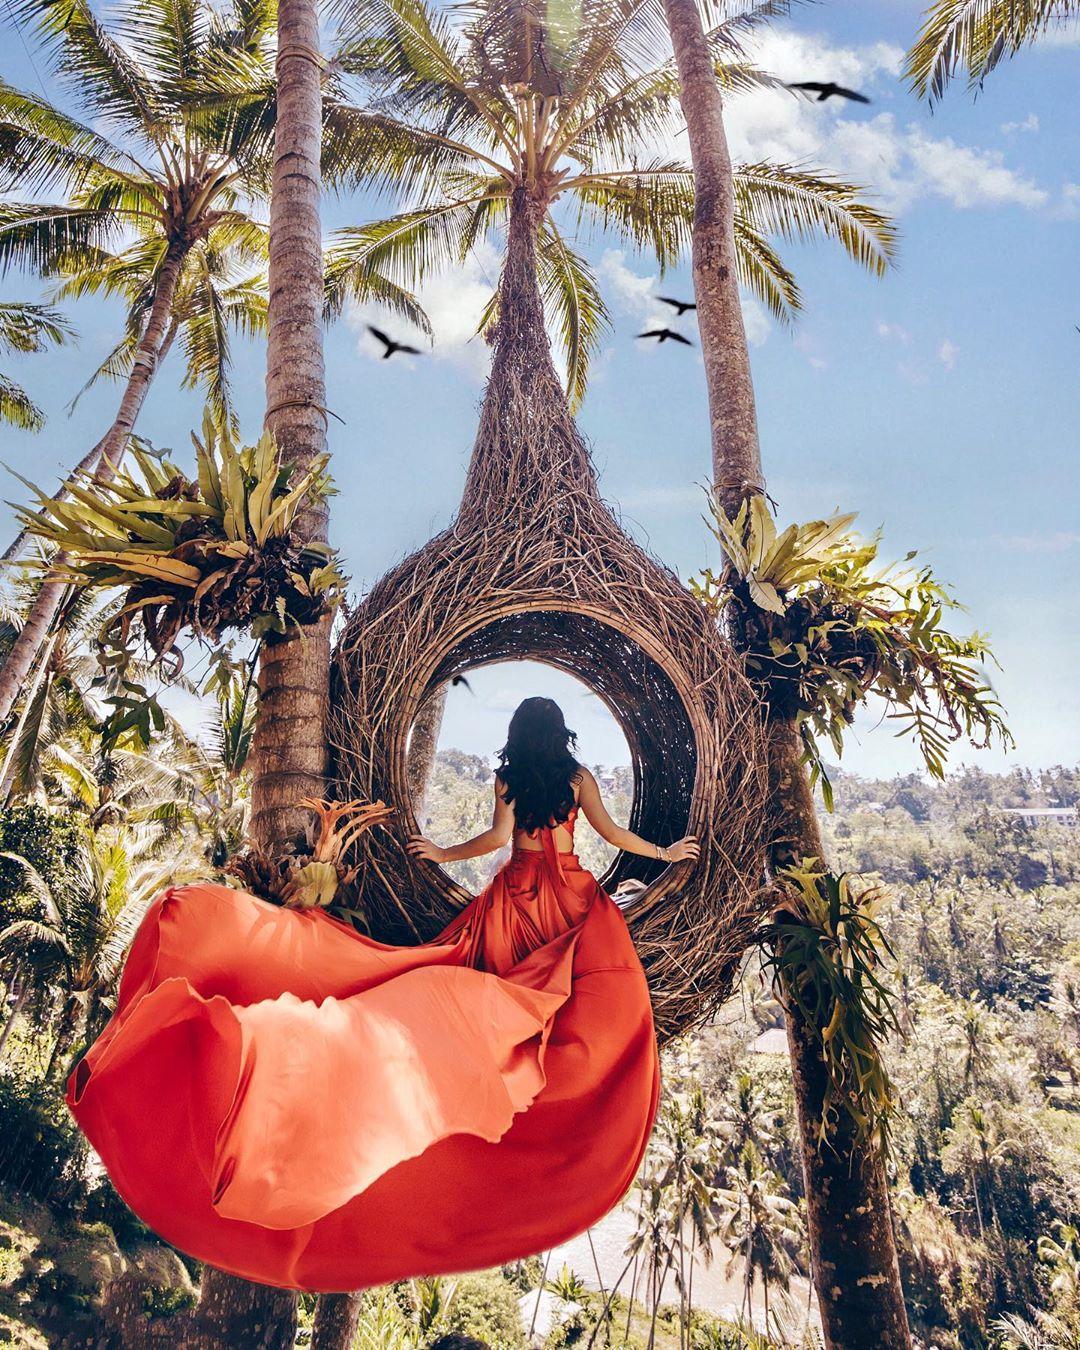 Kinh nghiệm du lịch Bali tự túc - Zen Hideaway- Bali Swing